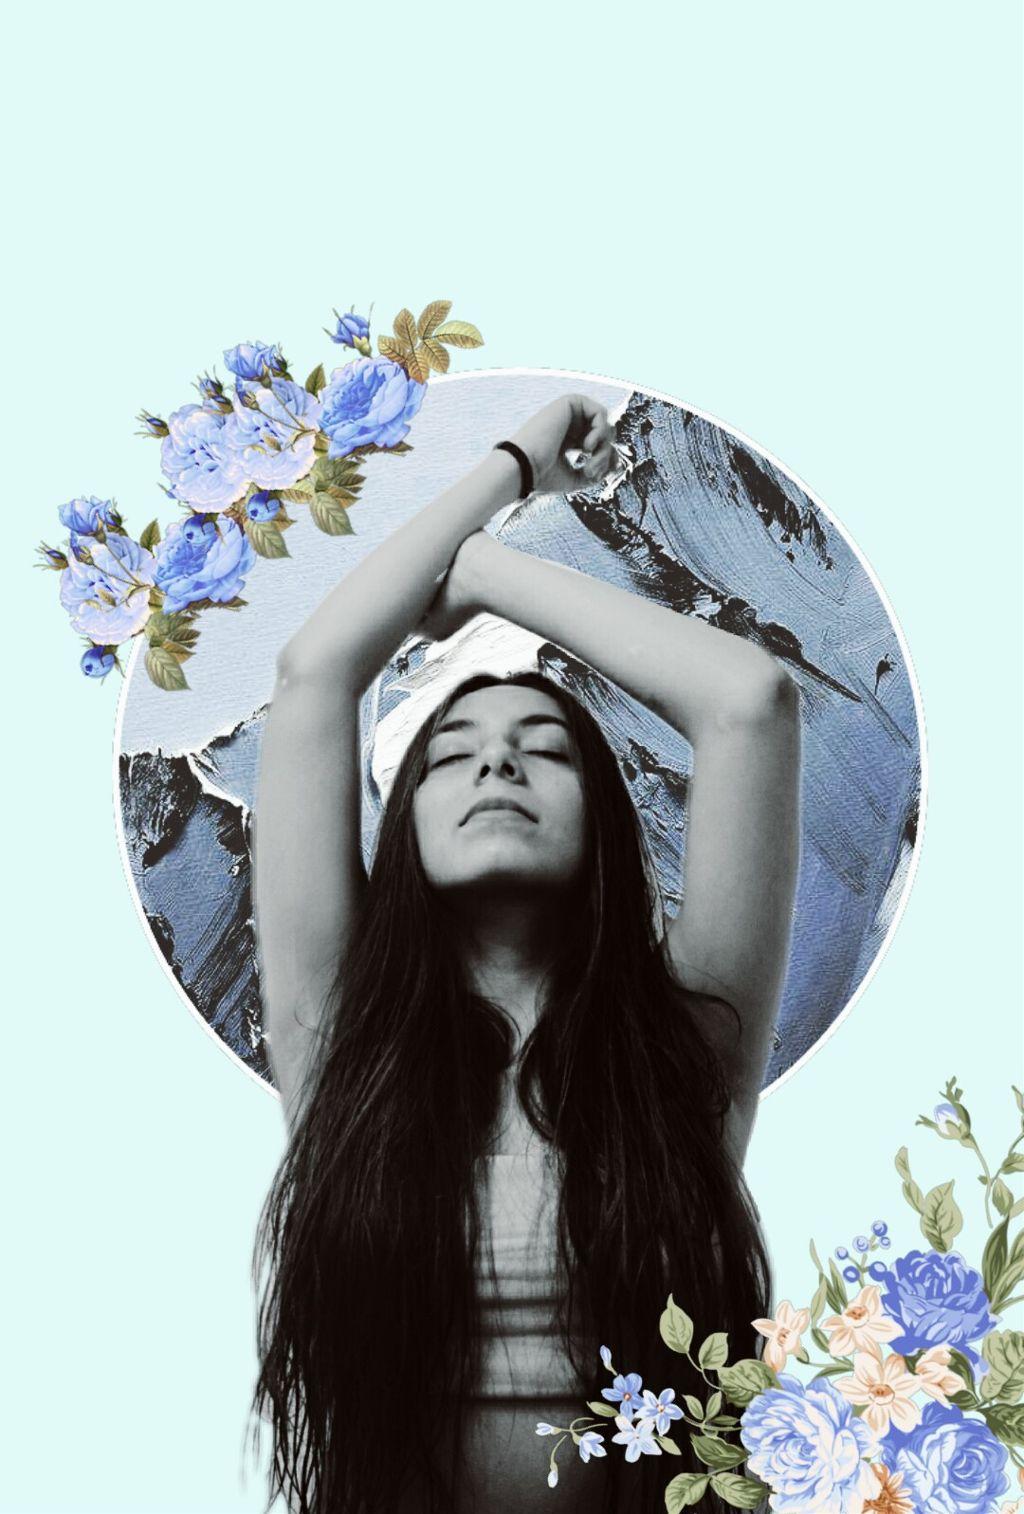 Breath In ----- Follow me on ig, niinque -----  #FreeToEdit  #girl  #remix  #freetoeditedited  #freetoeditremix  #mountain  #seafoam  #art  #interesting  #cool  #nice  #flowers  #niinque  #baby  #blackandwhite  #bokeh  #colorsplash  #emotions  #colorful  #petsandanimals  #photography